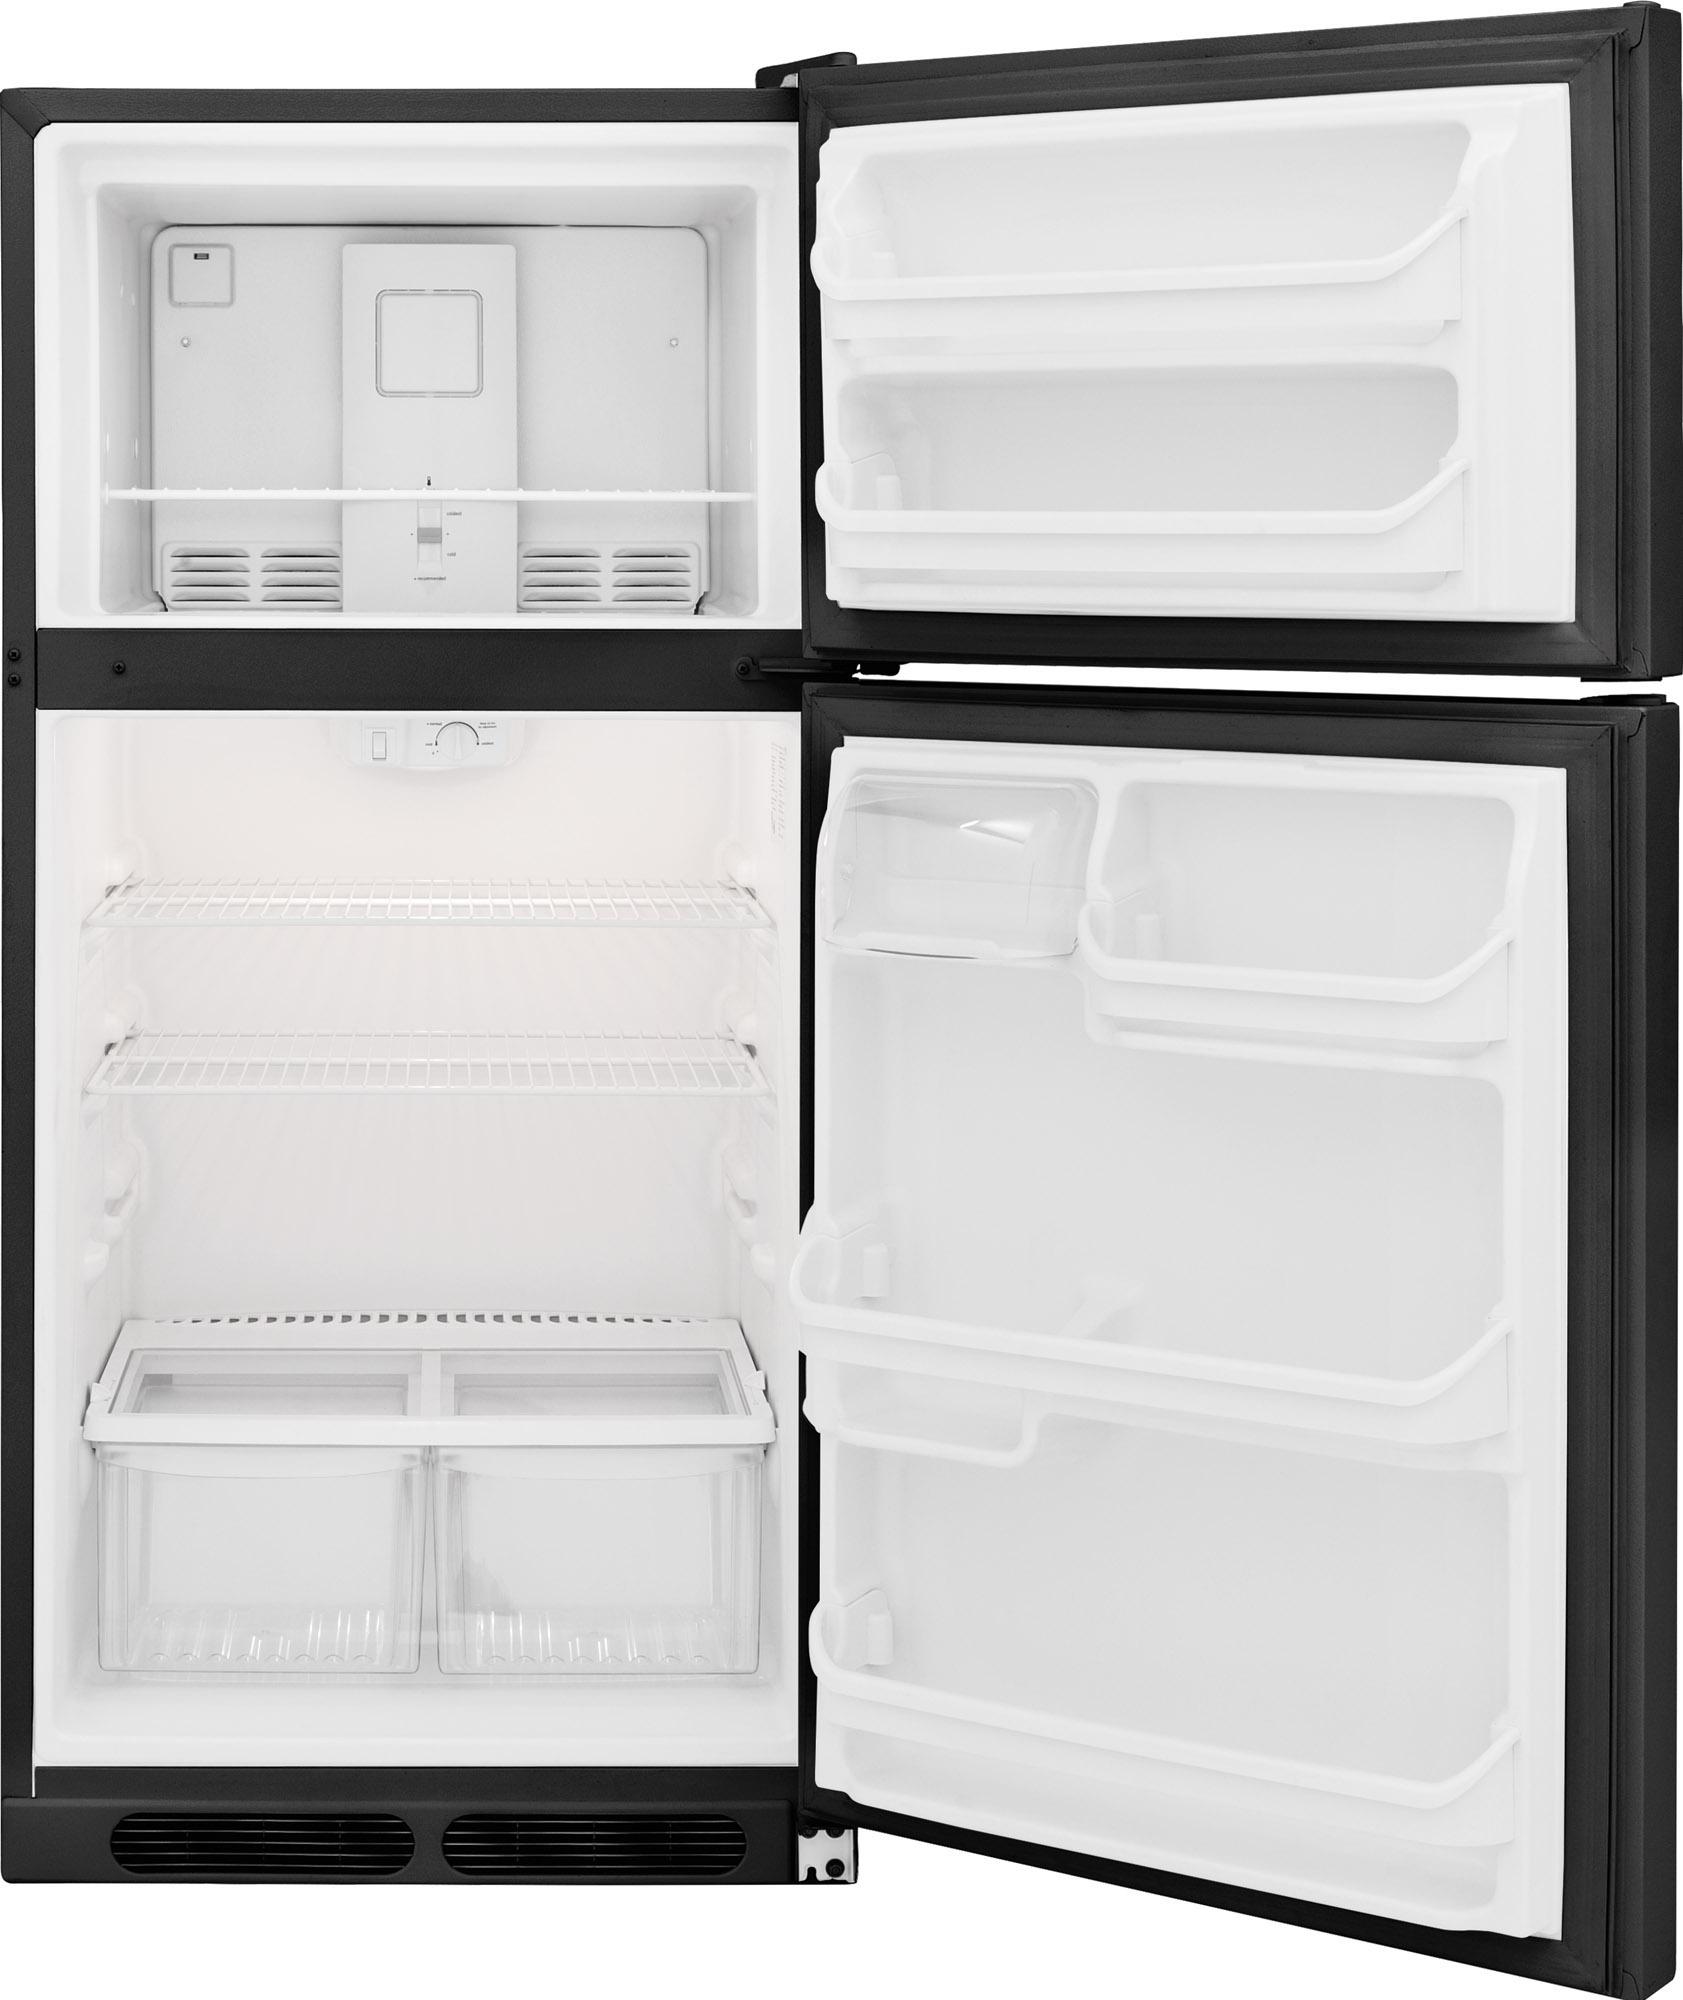 Frigidaire FFHT1514QB 14.5 cu. ft. Top-Mount Refrigerator - Black